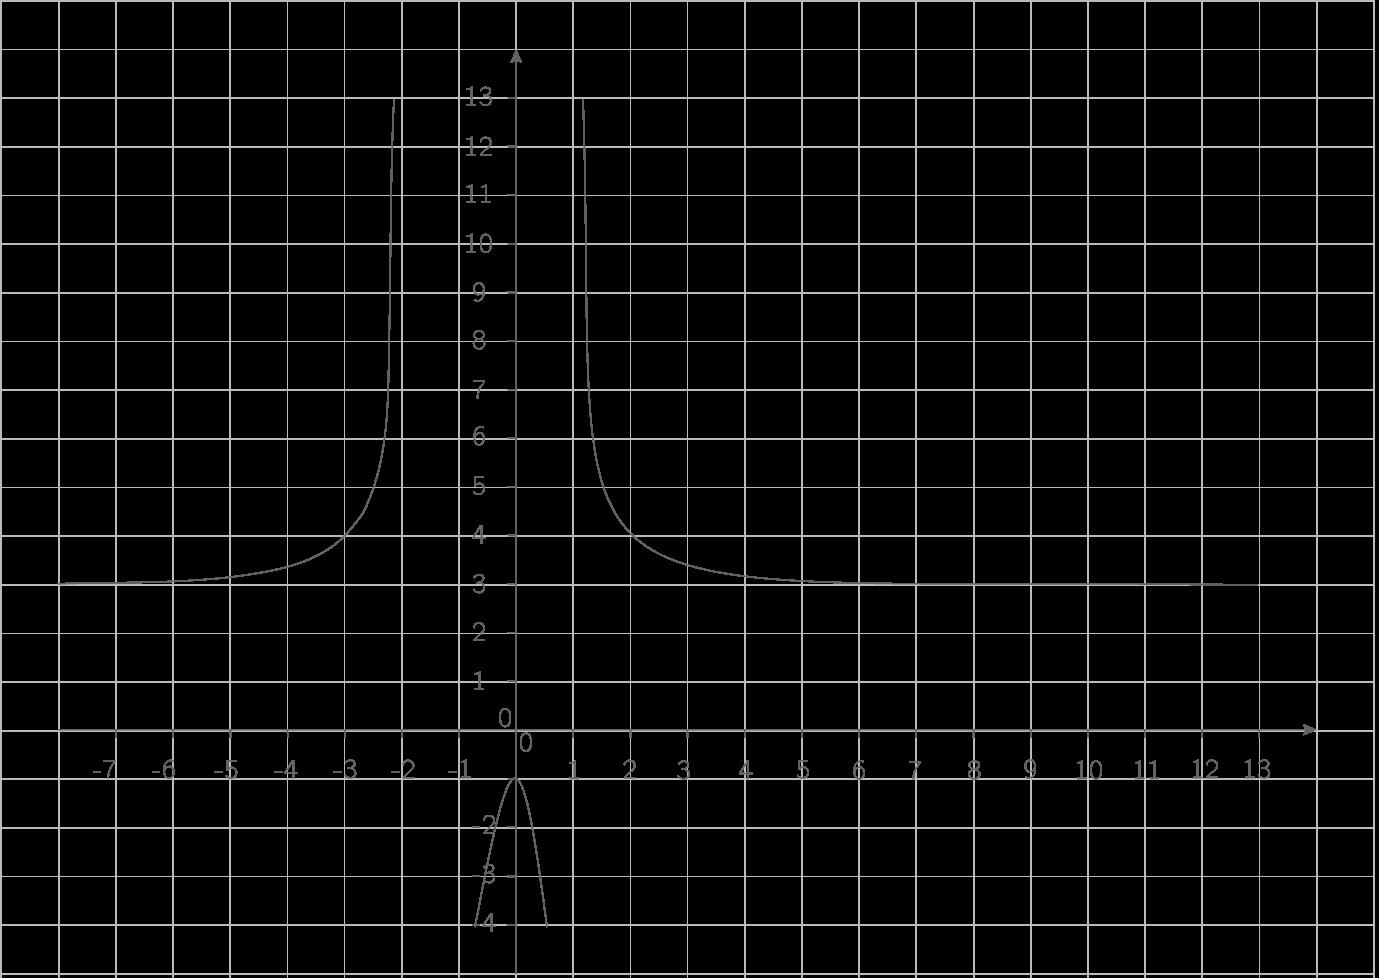 Représentation de \(\displaystyle{x\mapsto\dfrac{3x^2+1}{x^2-1}}\) :